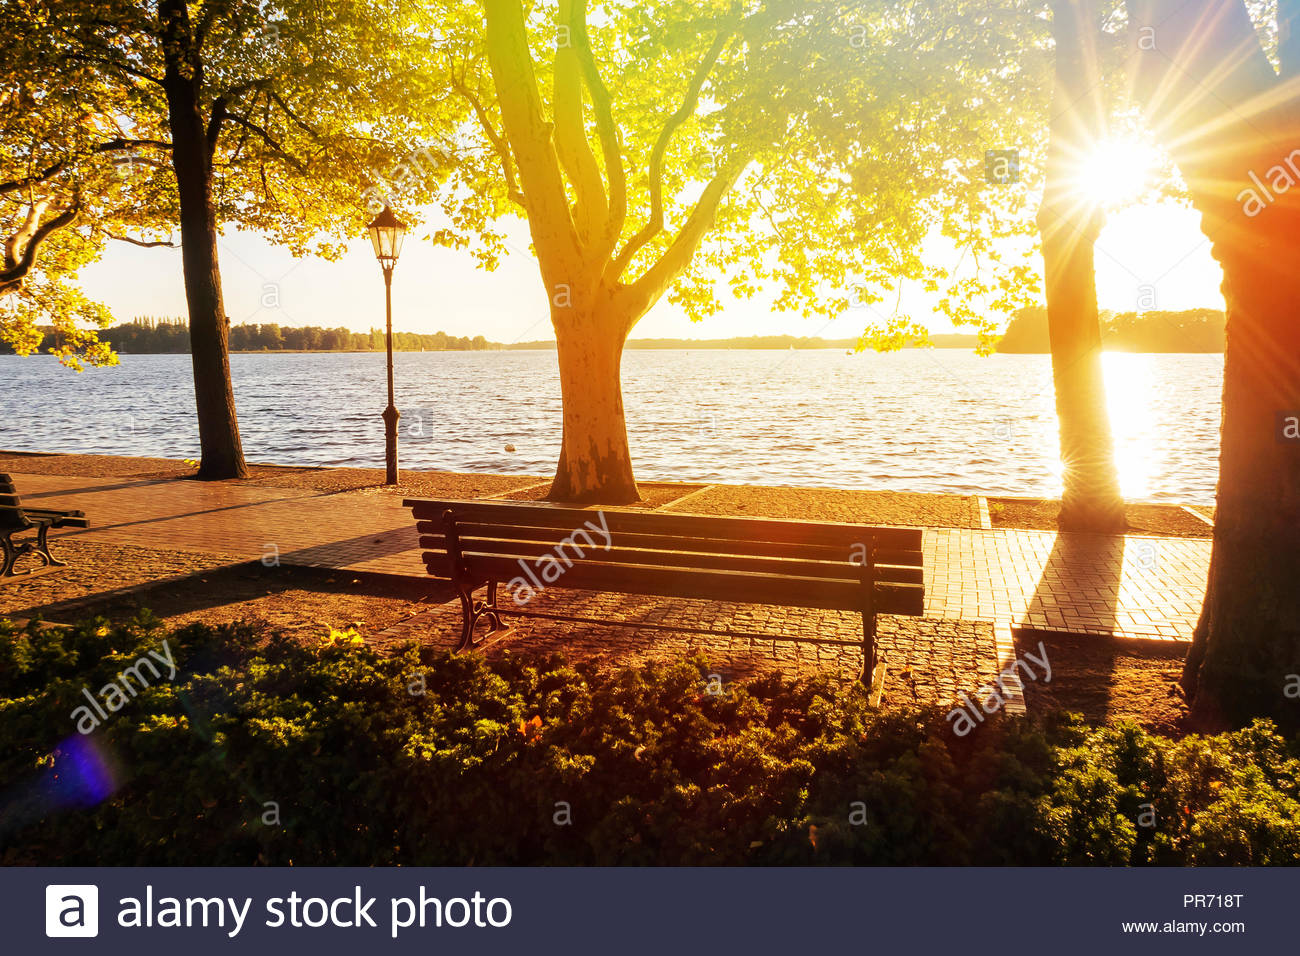 City Park Bench at Lakeshore Tegeler Lake in Berlin Germany